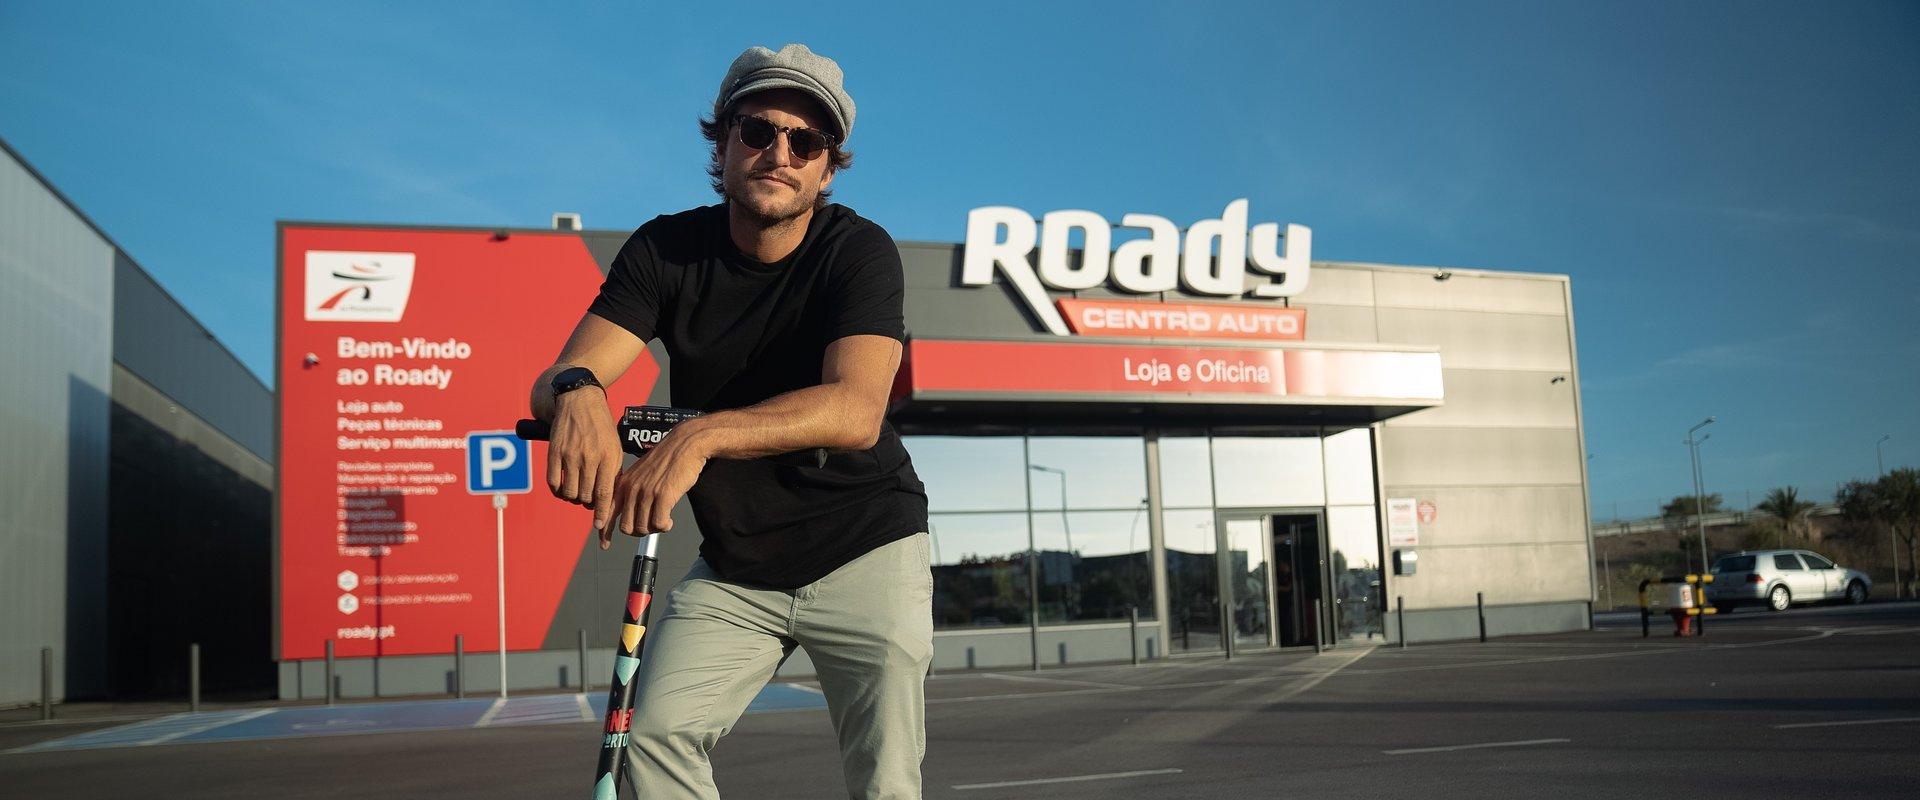 "Roady continua a ""Trotinetar Portugal"" na Semana Europeia da Mobilidade"